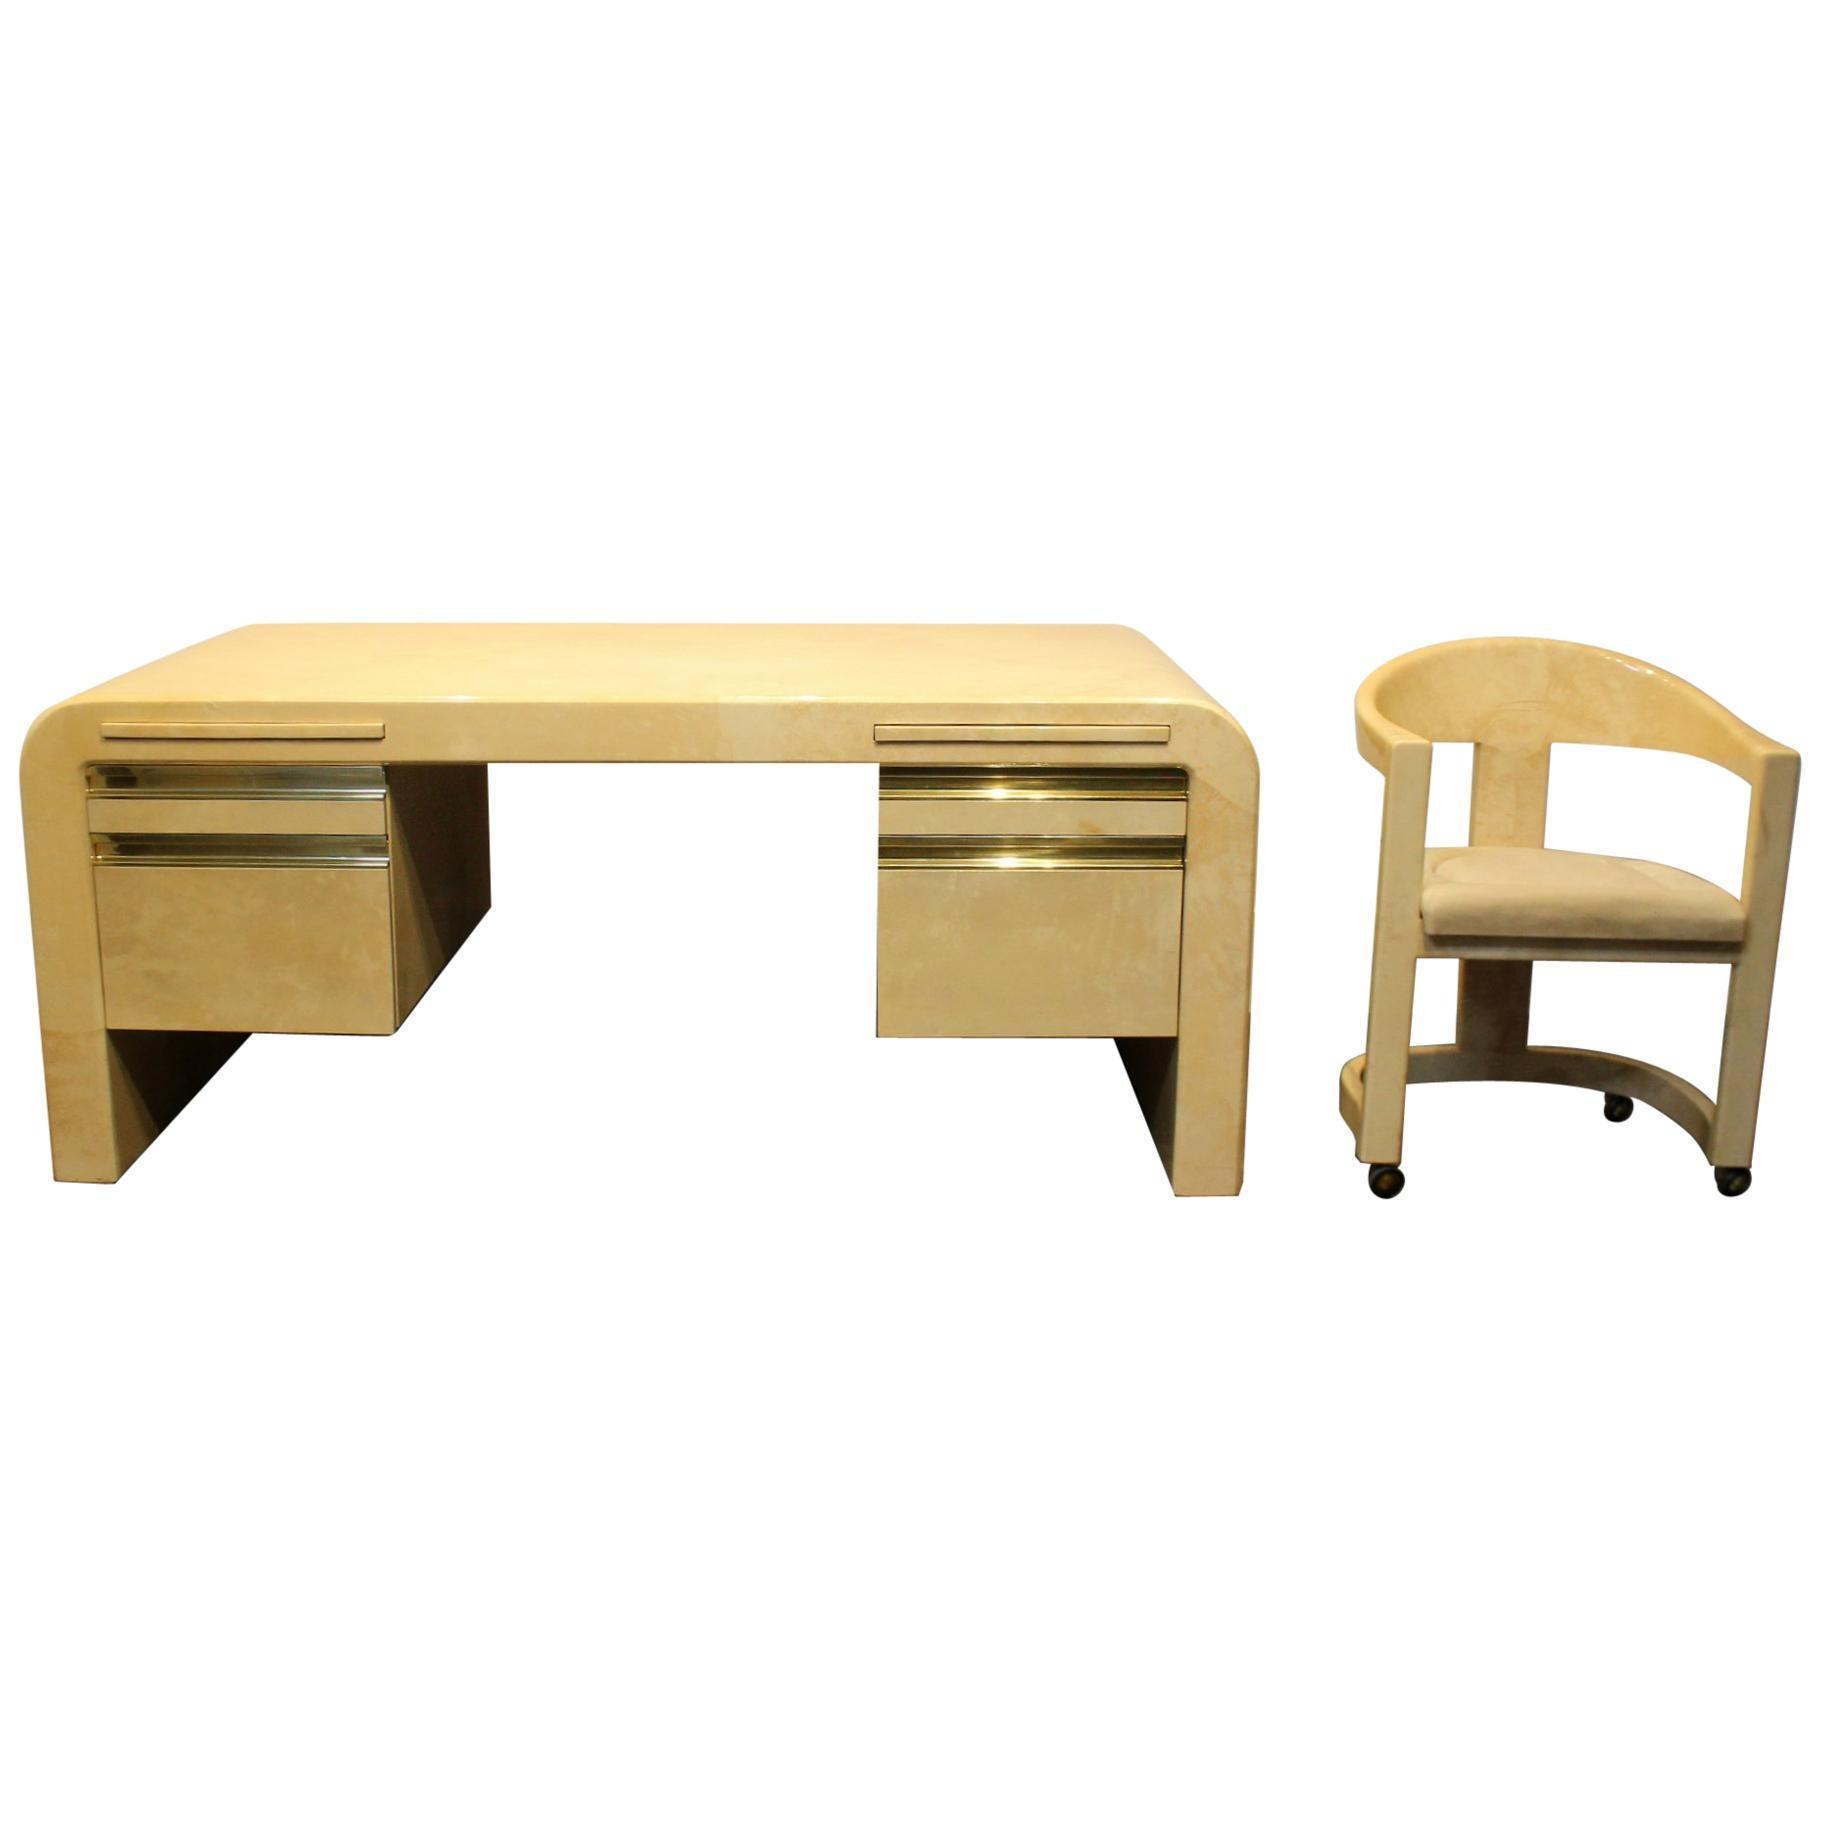 1970s Karl Springer Mid Century Modern Lacquered Goat Skin Desk And Chair At 1stdibs